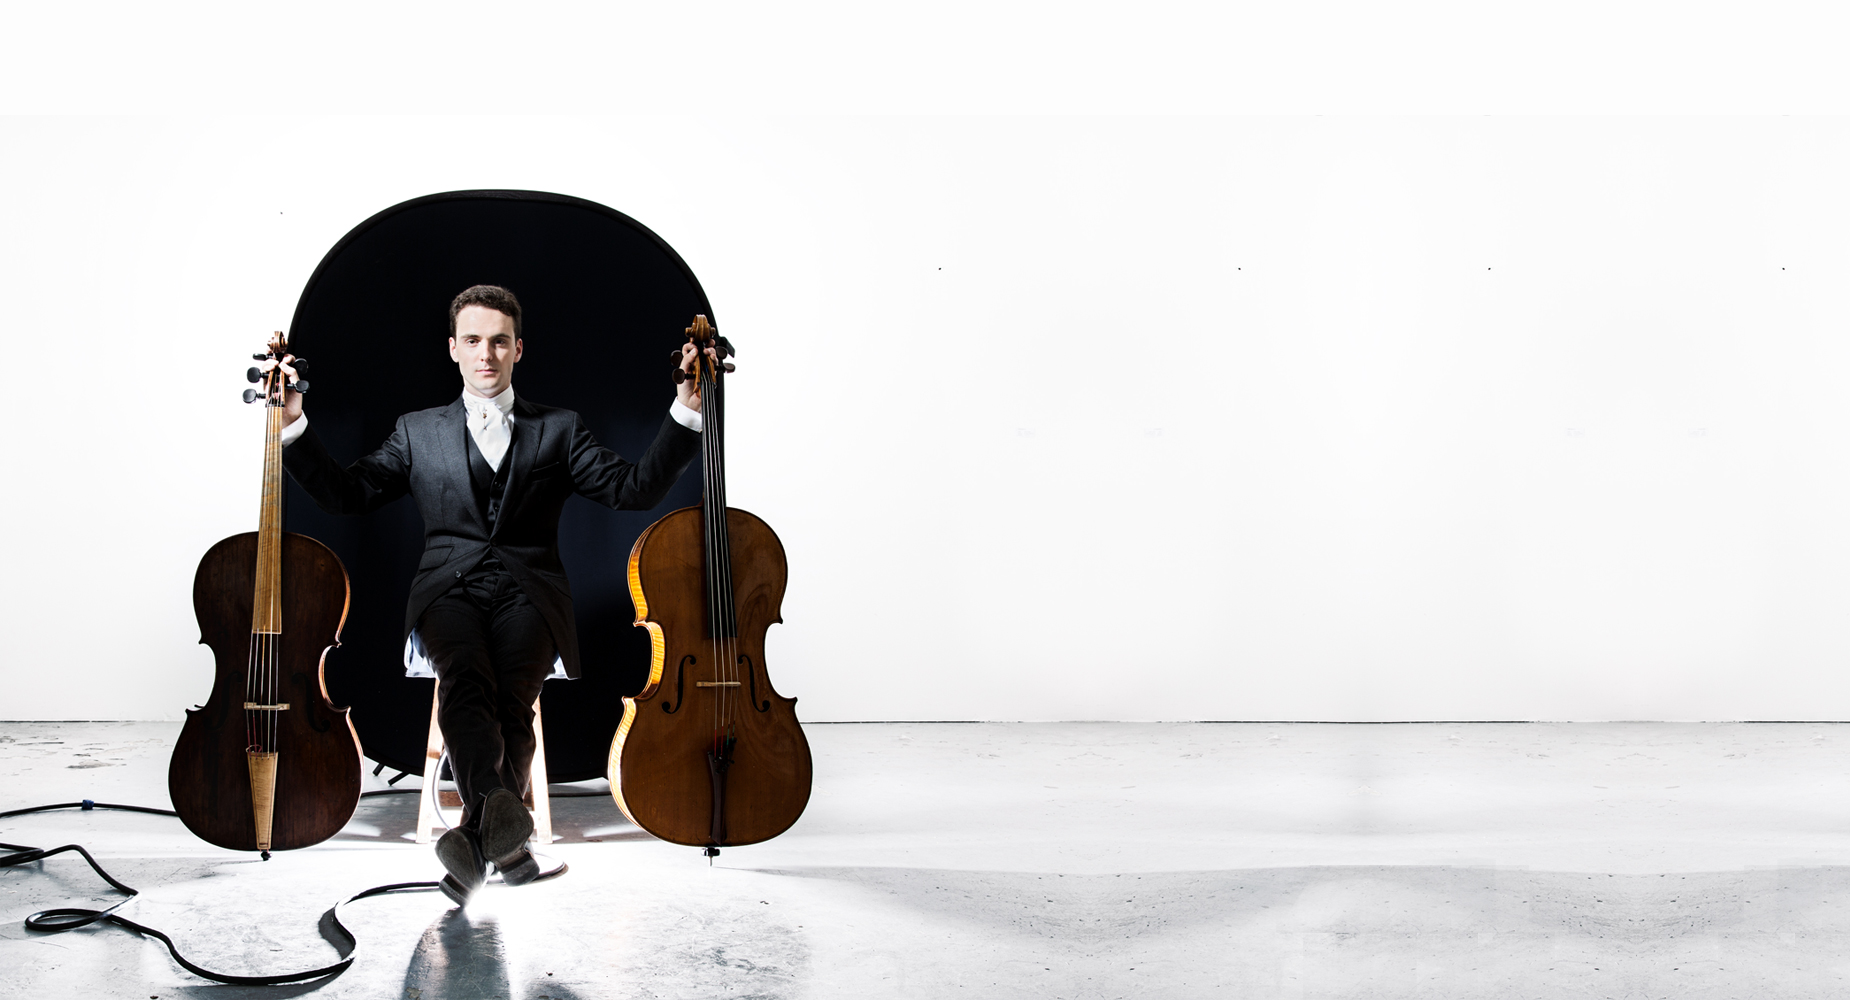 Charles-Antoine Duflot, cellist